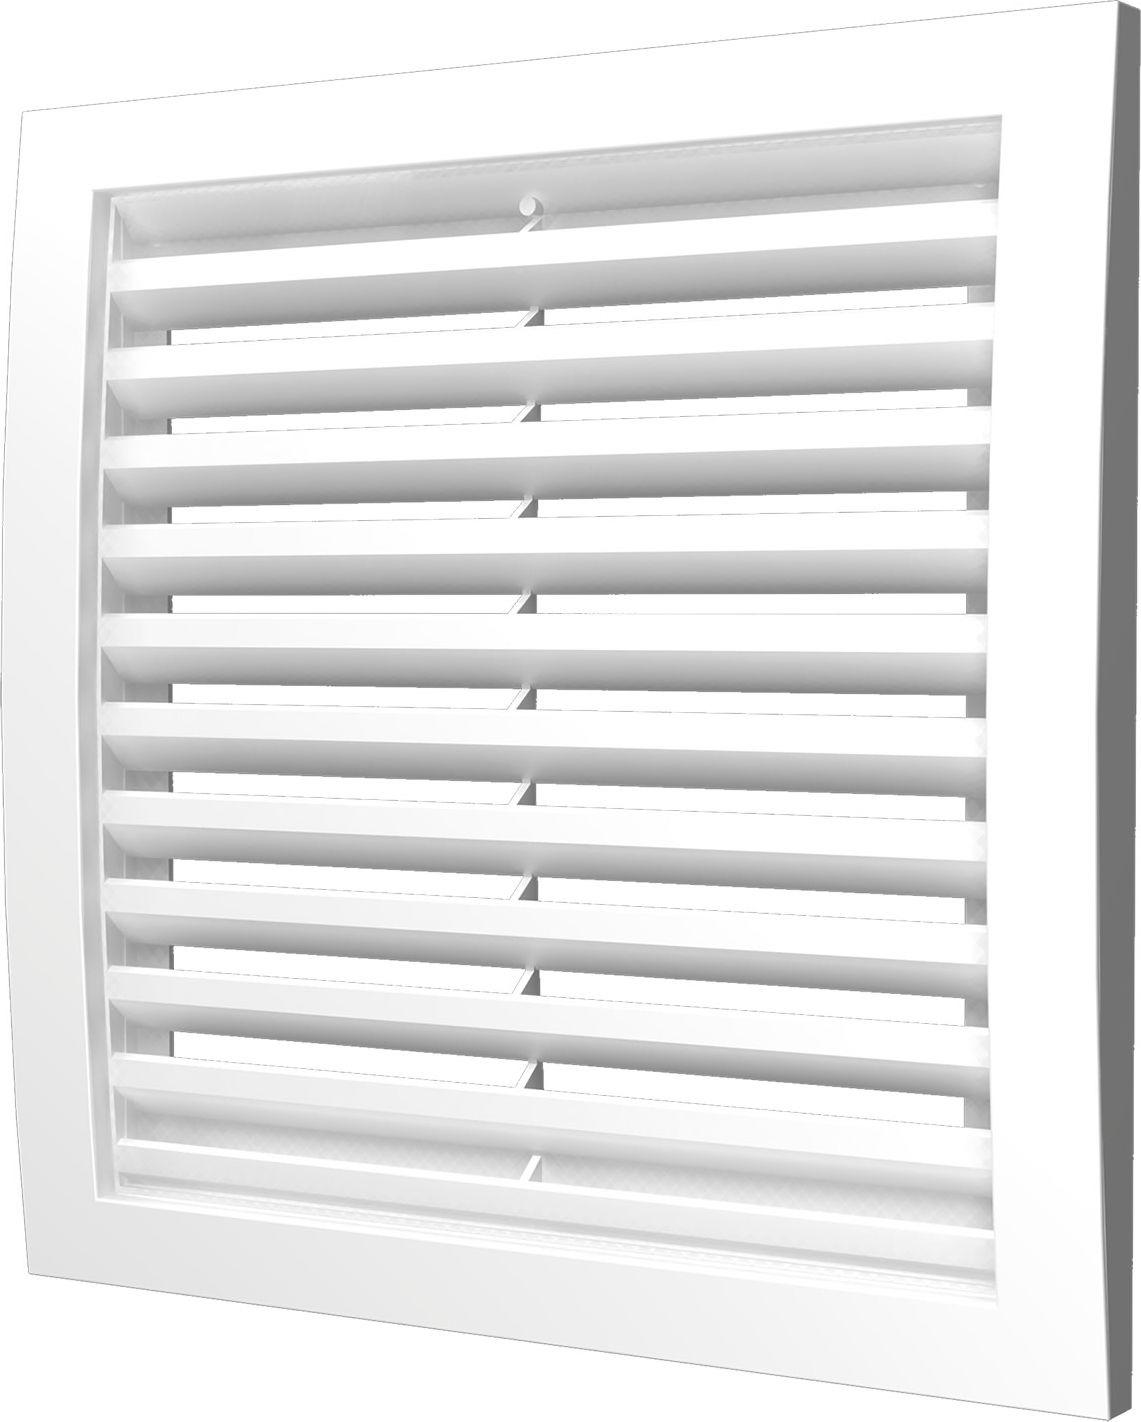 Вентиляционная решетка Street Line, 3535РРН, белый, наружная, 35 х см